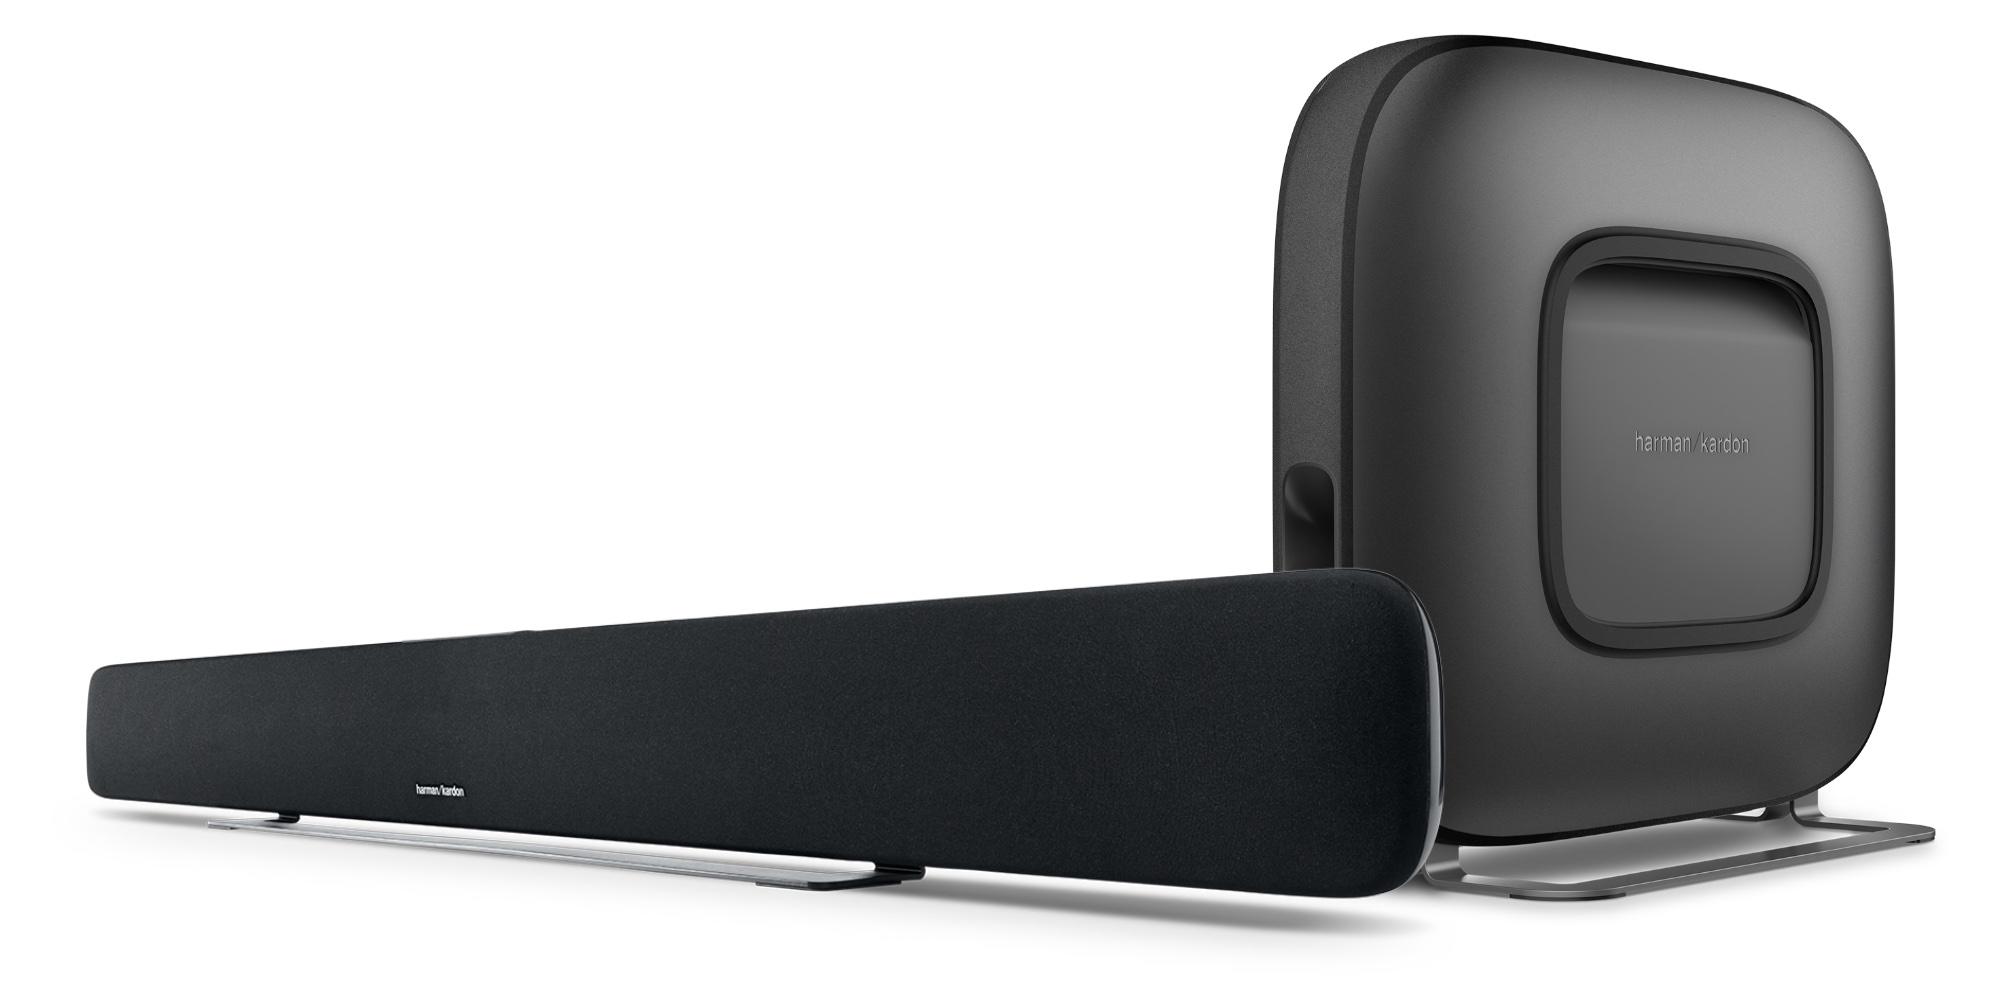 Harman Kardon's $900 Omni Bar+ Soundbar has dropped to its lowest price yet at $265